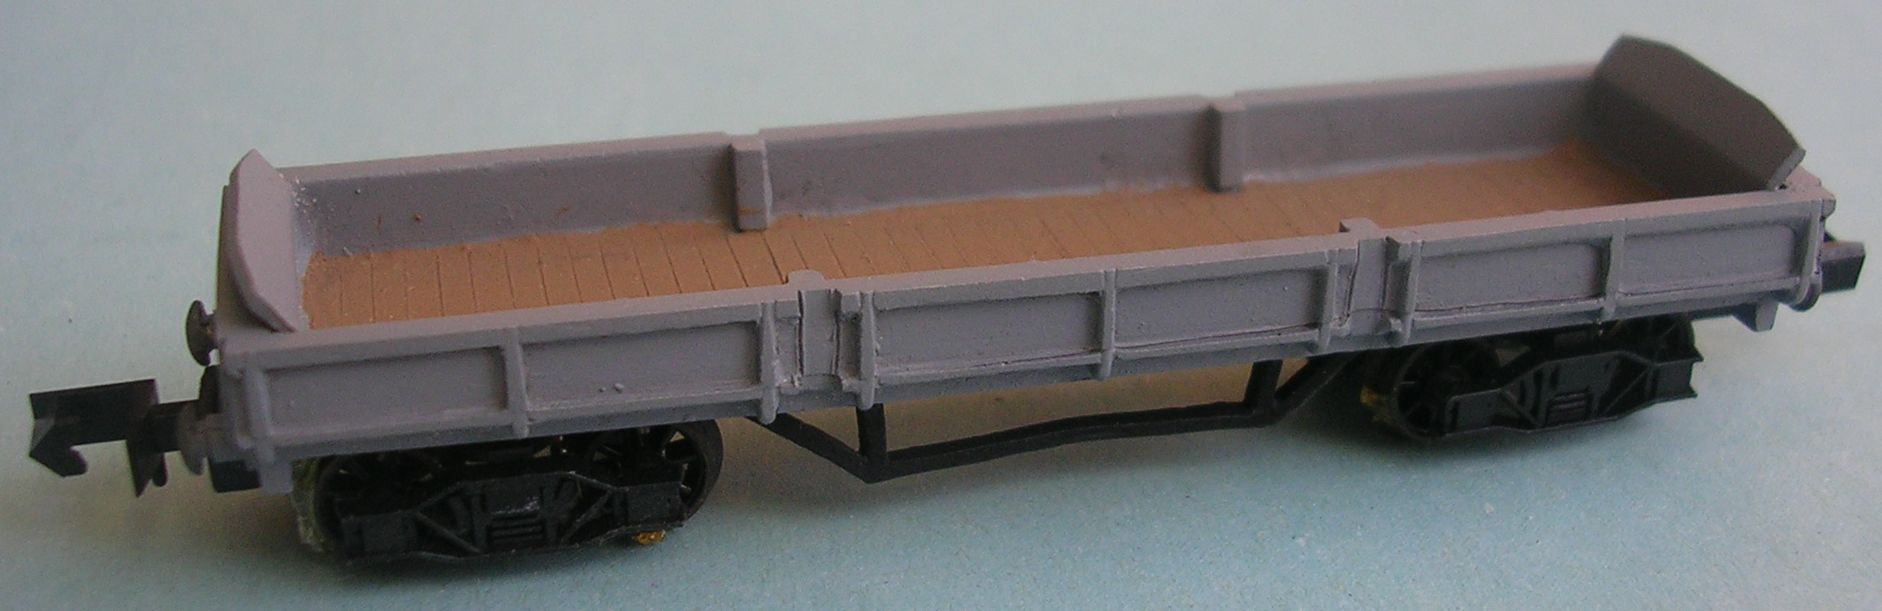 NW28 Turbot 34t Bogie Wagon